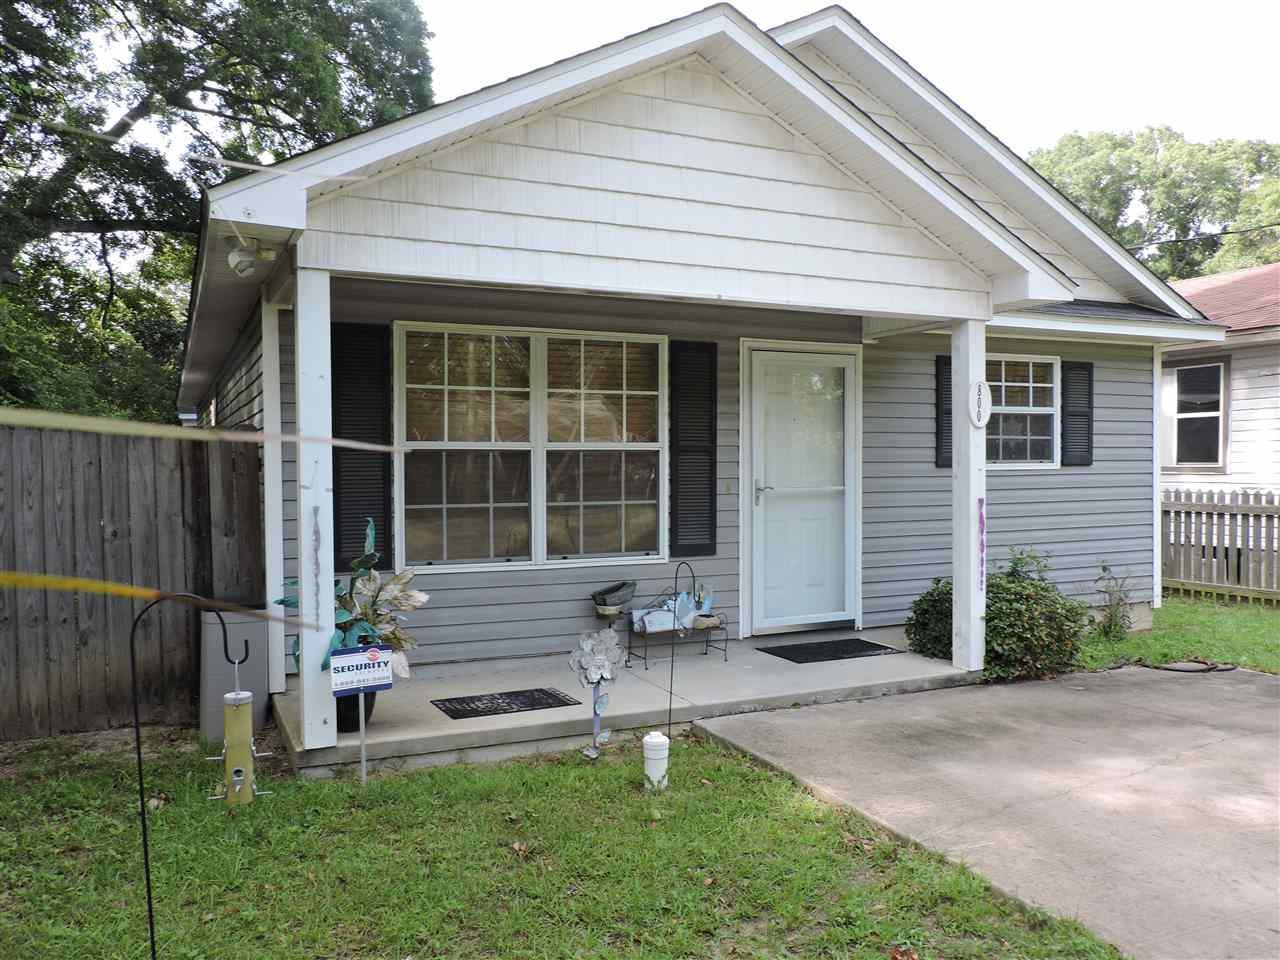 800 E Baars St, Pensacola, FL 32503